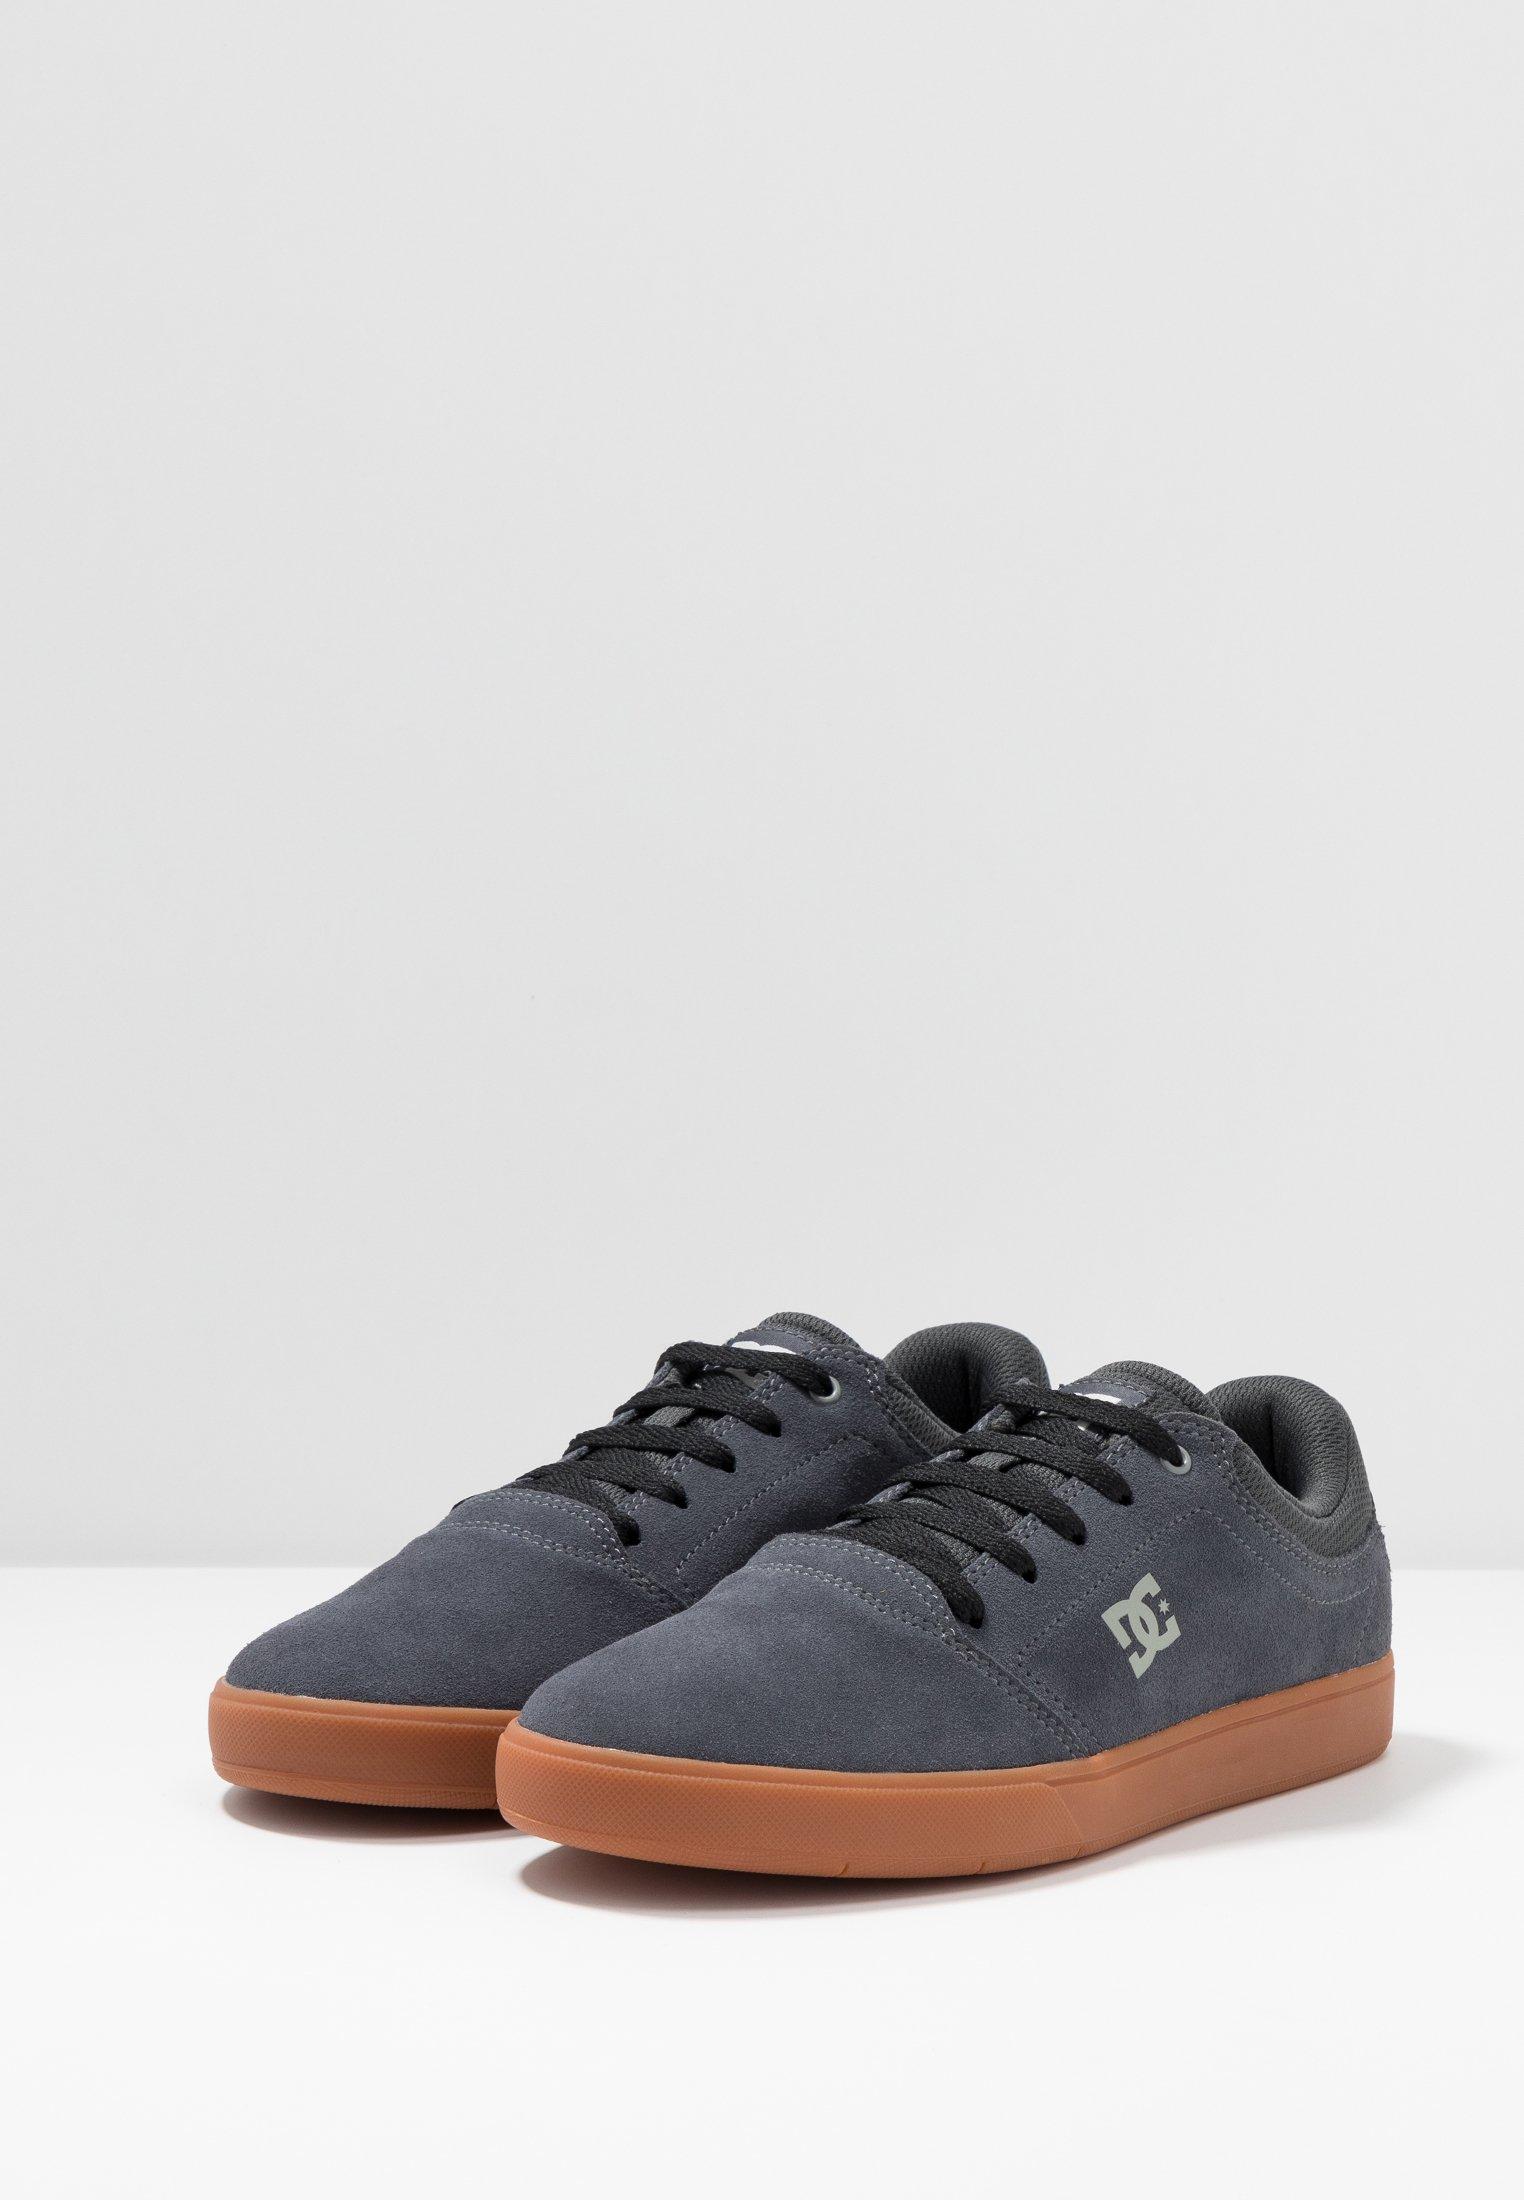 Skate De Charcoal Dc Shoes CrisisChaussures 1c3uTKJlF